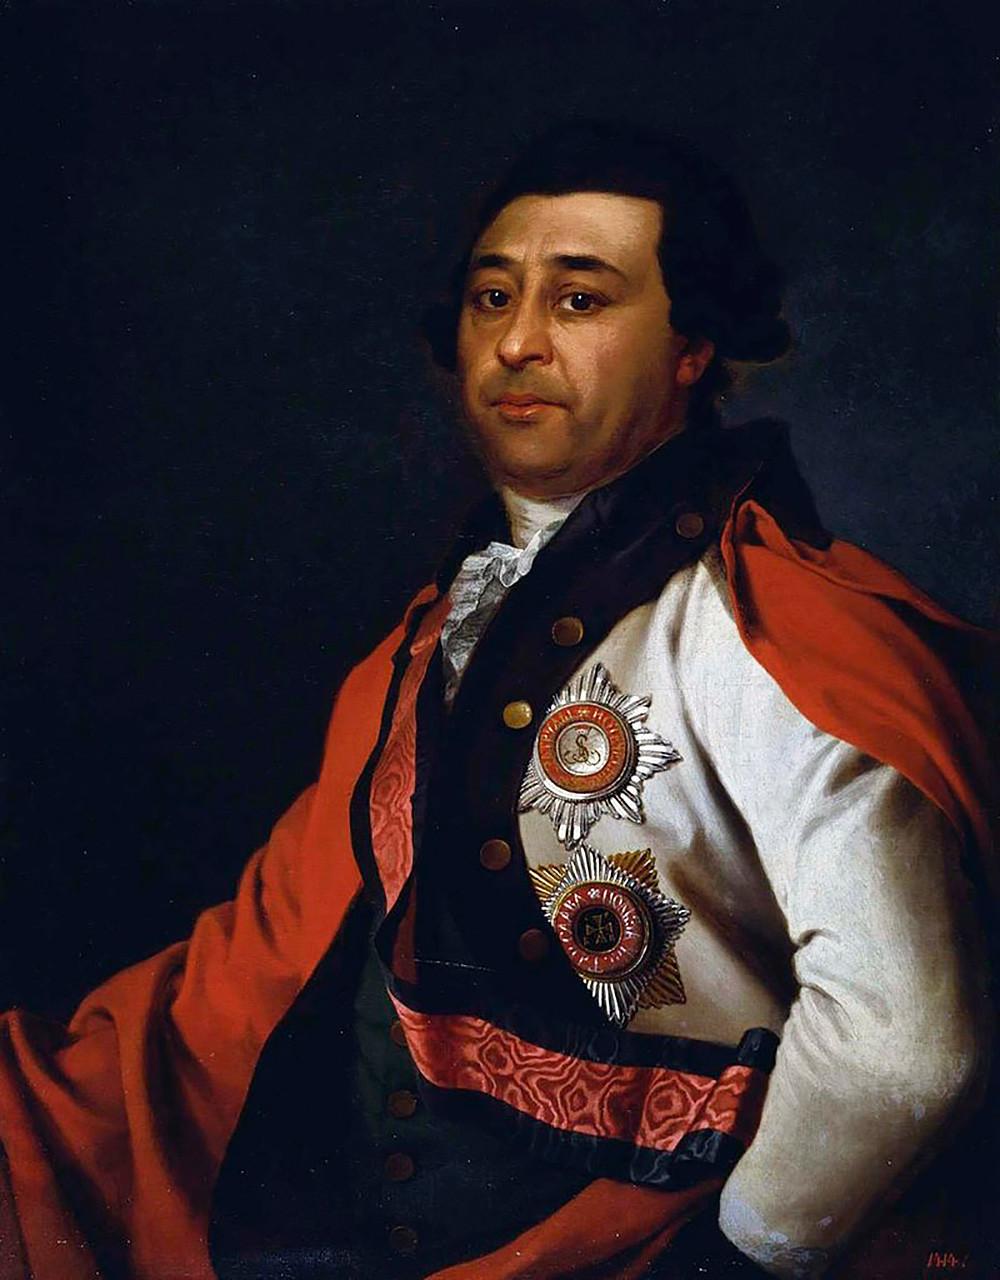 'Portrait of Ivan Hannibal, Abram Hannibal's son' by Dmitry Levitsky